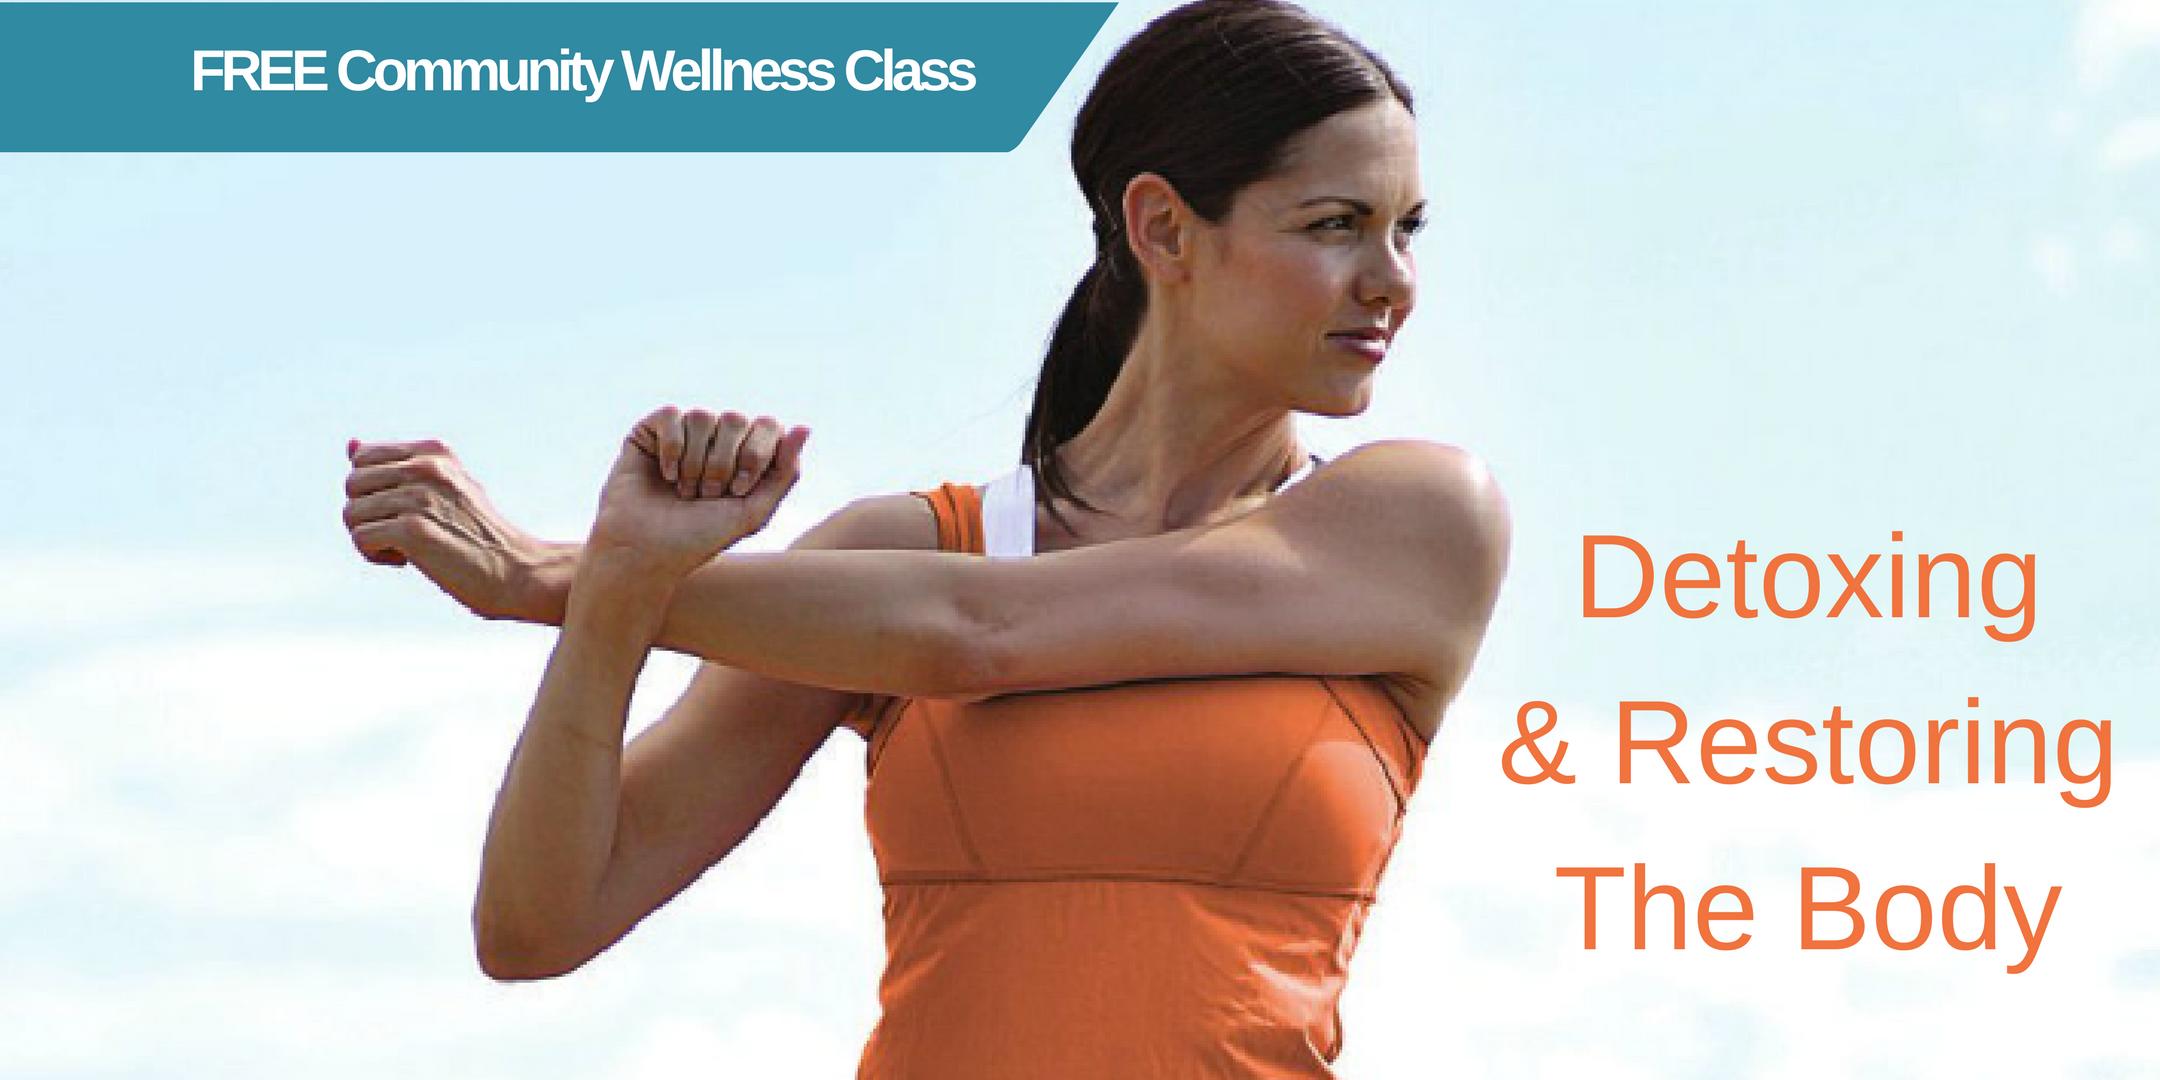 Detoxing & Restoring the Body